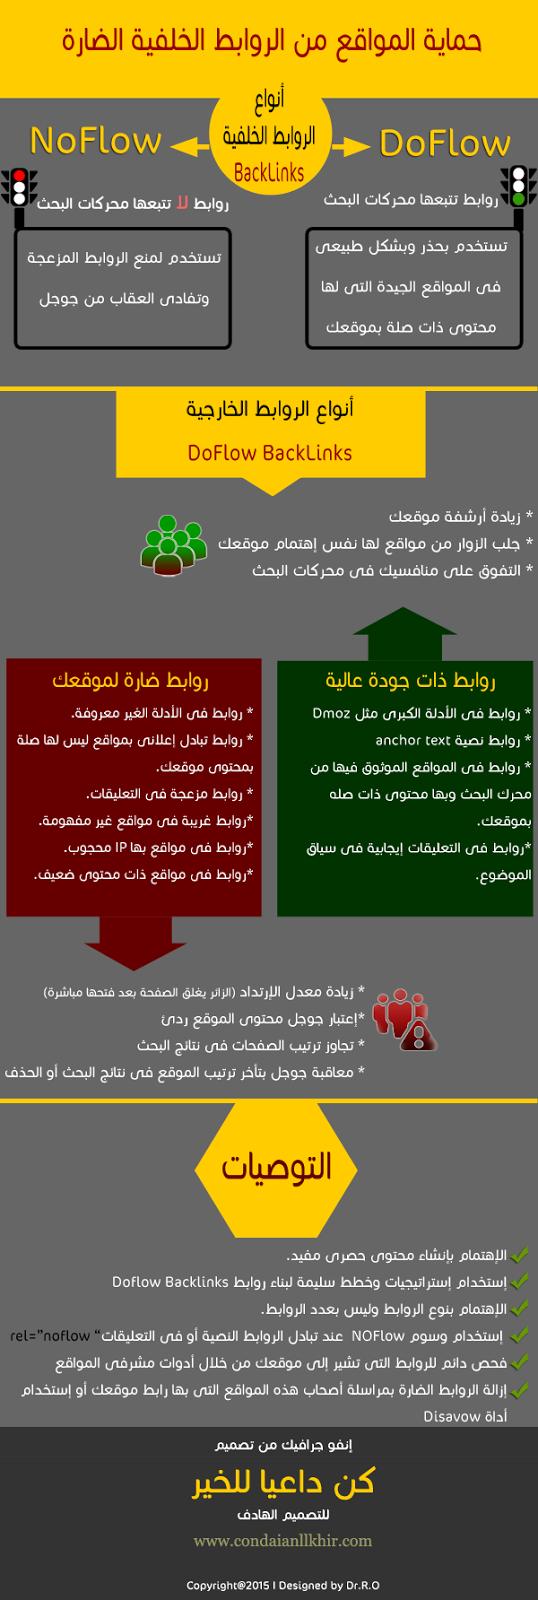 Backlinks infographic